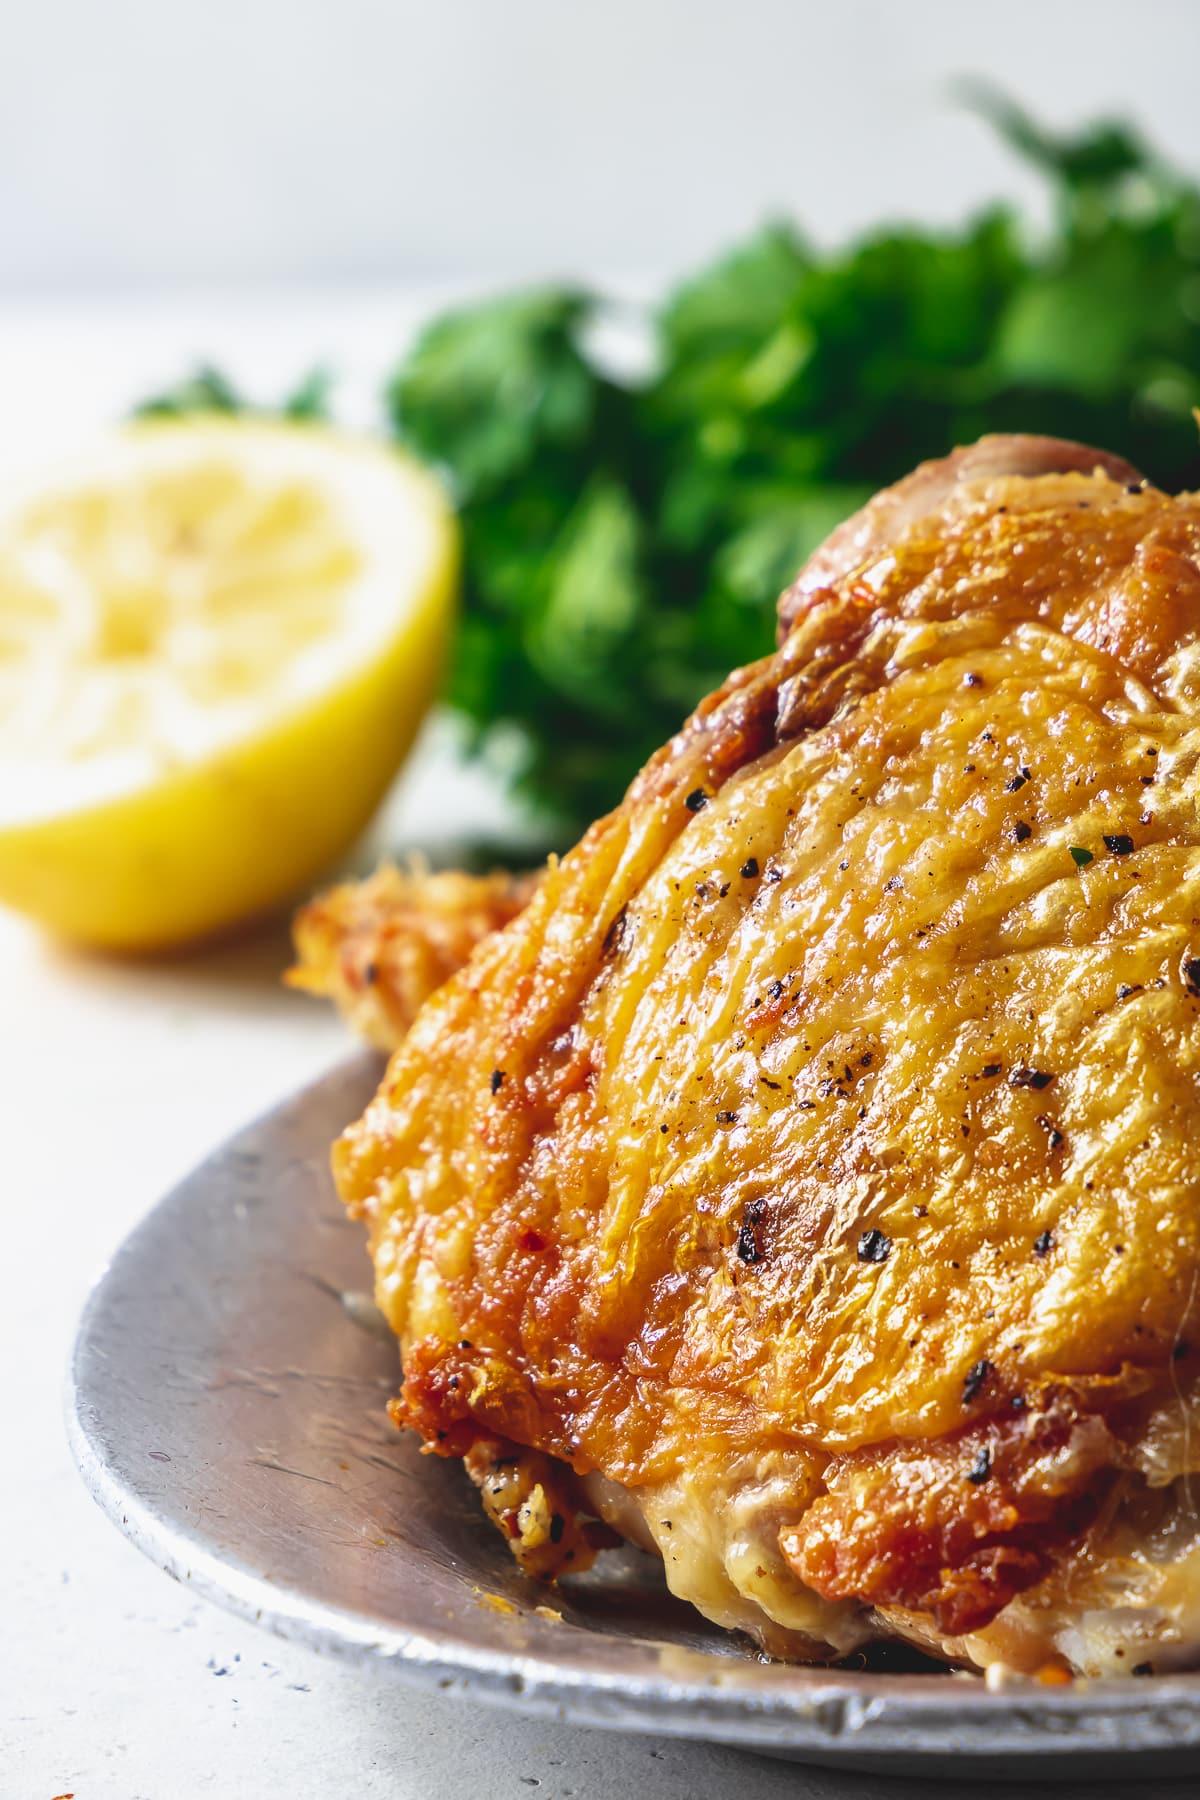 crispy pan fried chicken thigh close up